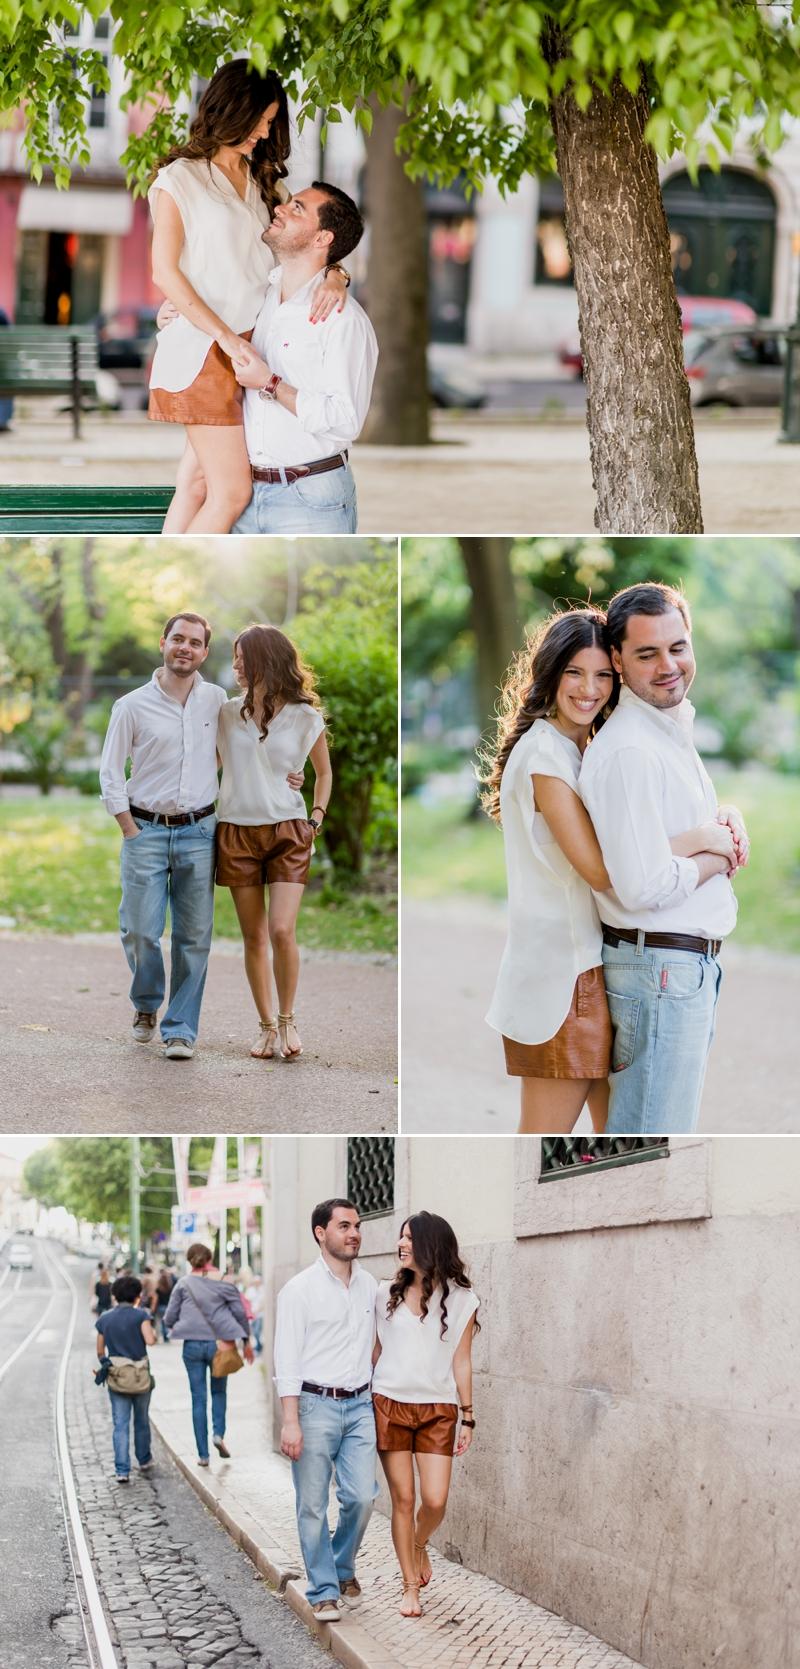 MR_Engagement_portugal_wedding_photographer-5.jpg